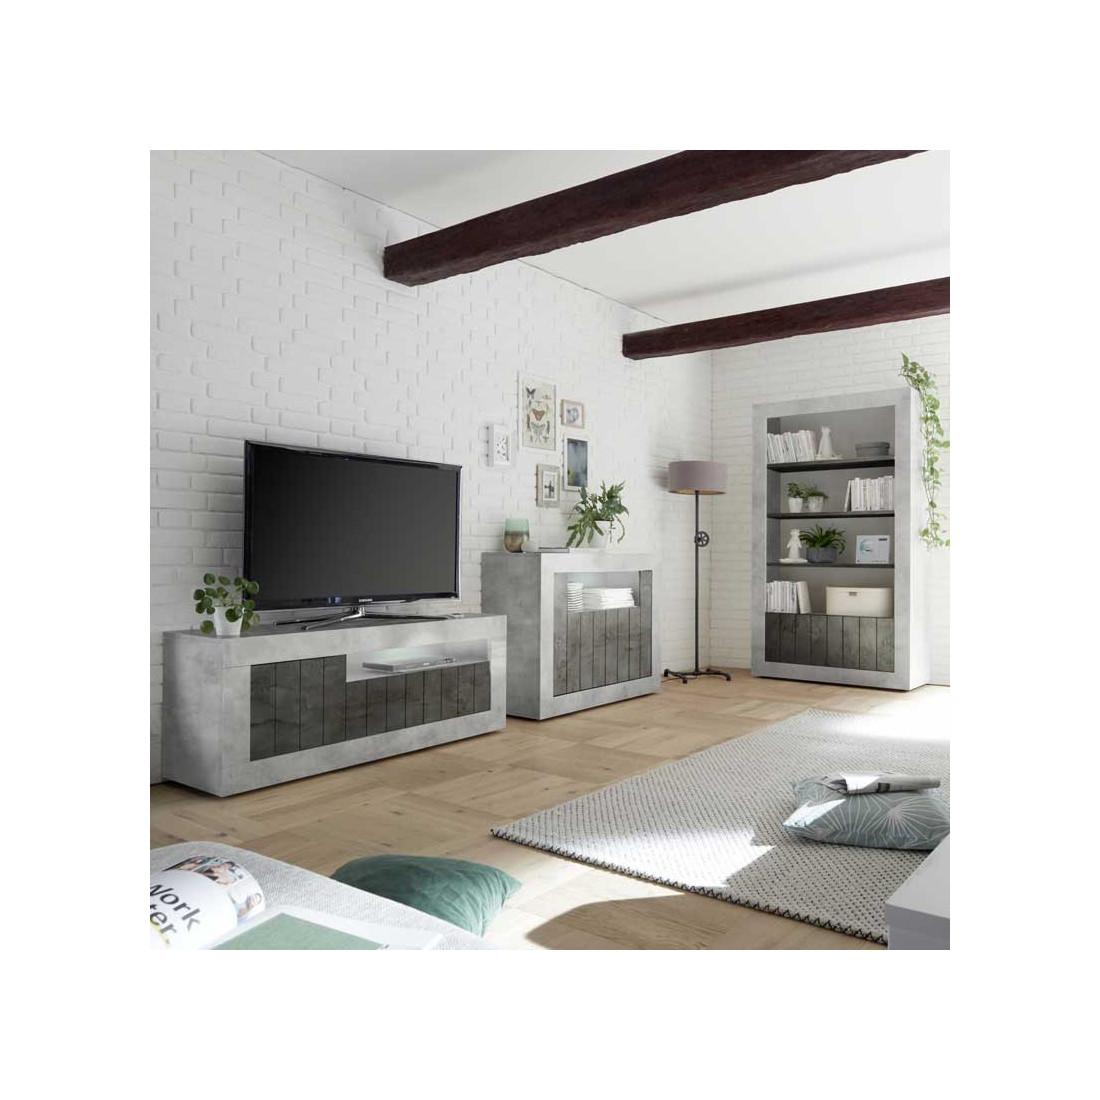 meuble d 39 entr e b ton cir clair fonc lubio n 1 petits. Black Bedroom Furniture Sets. Home Design Ideas